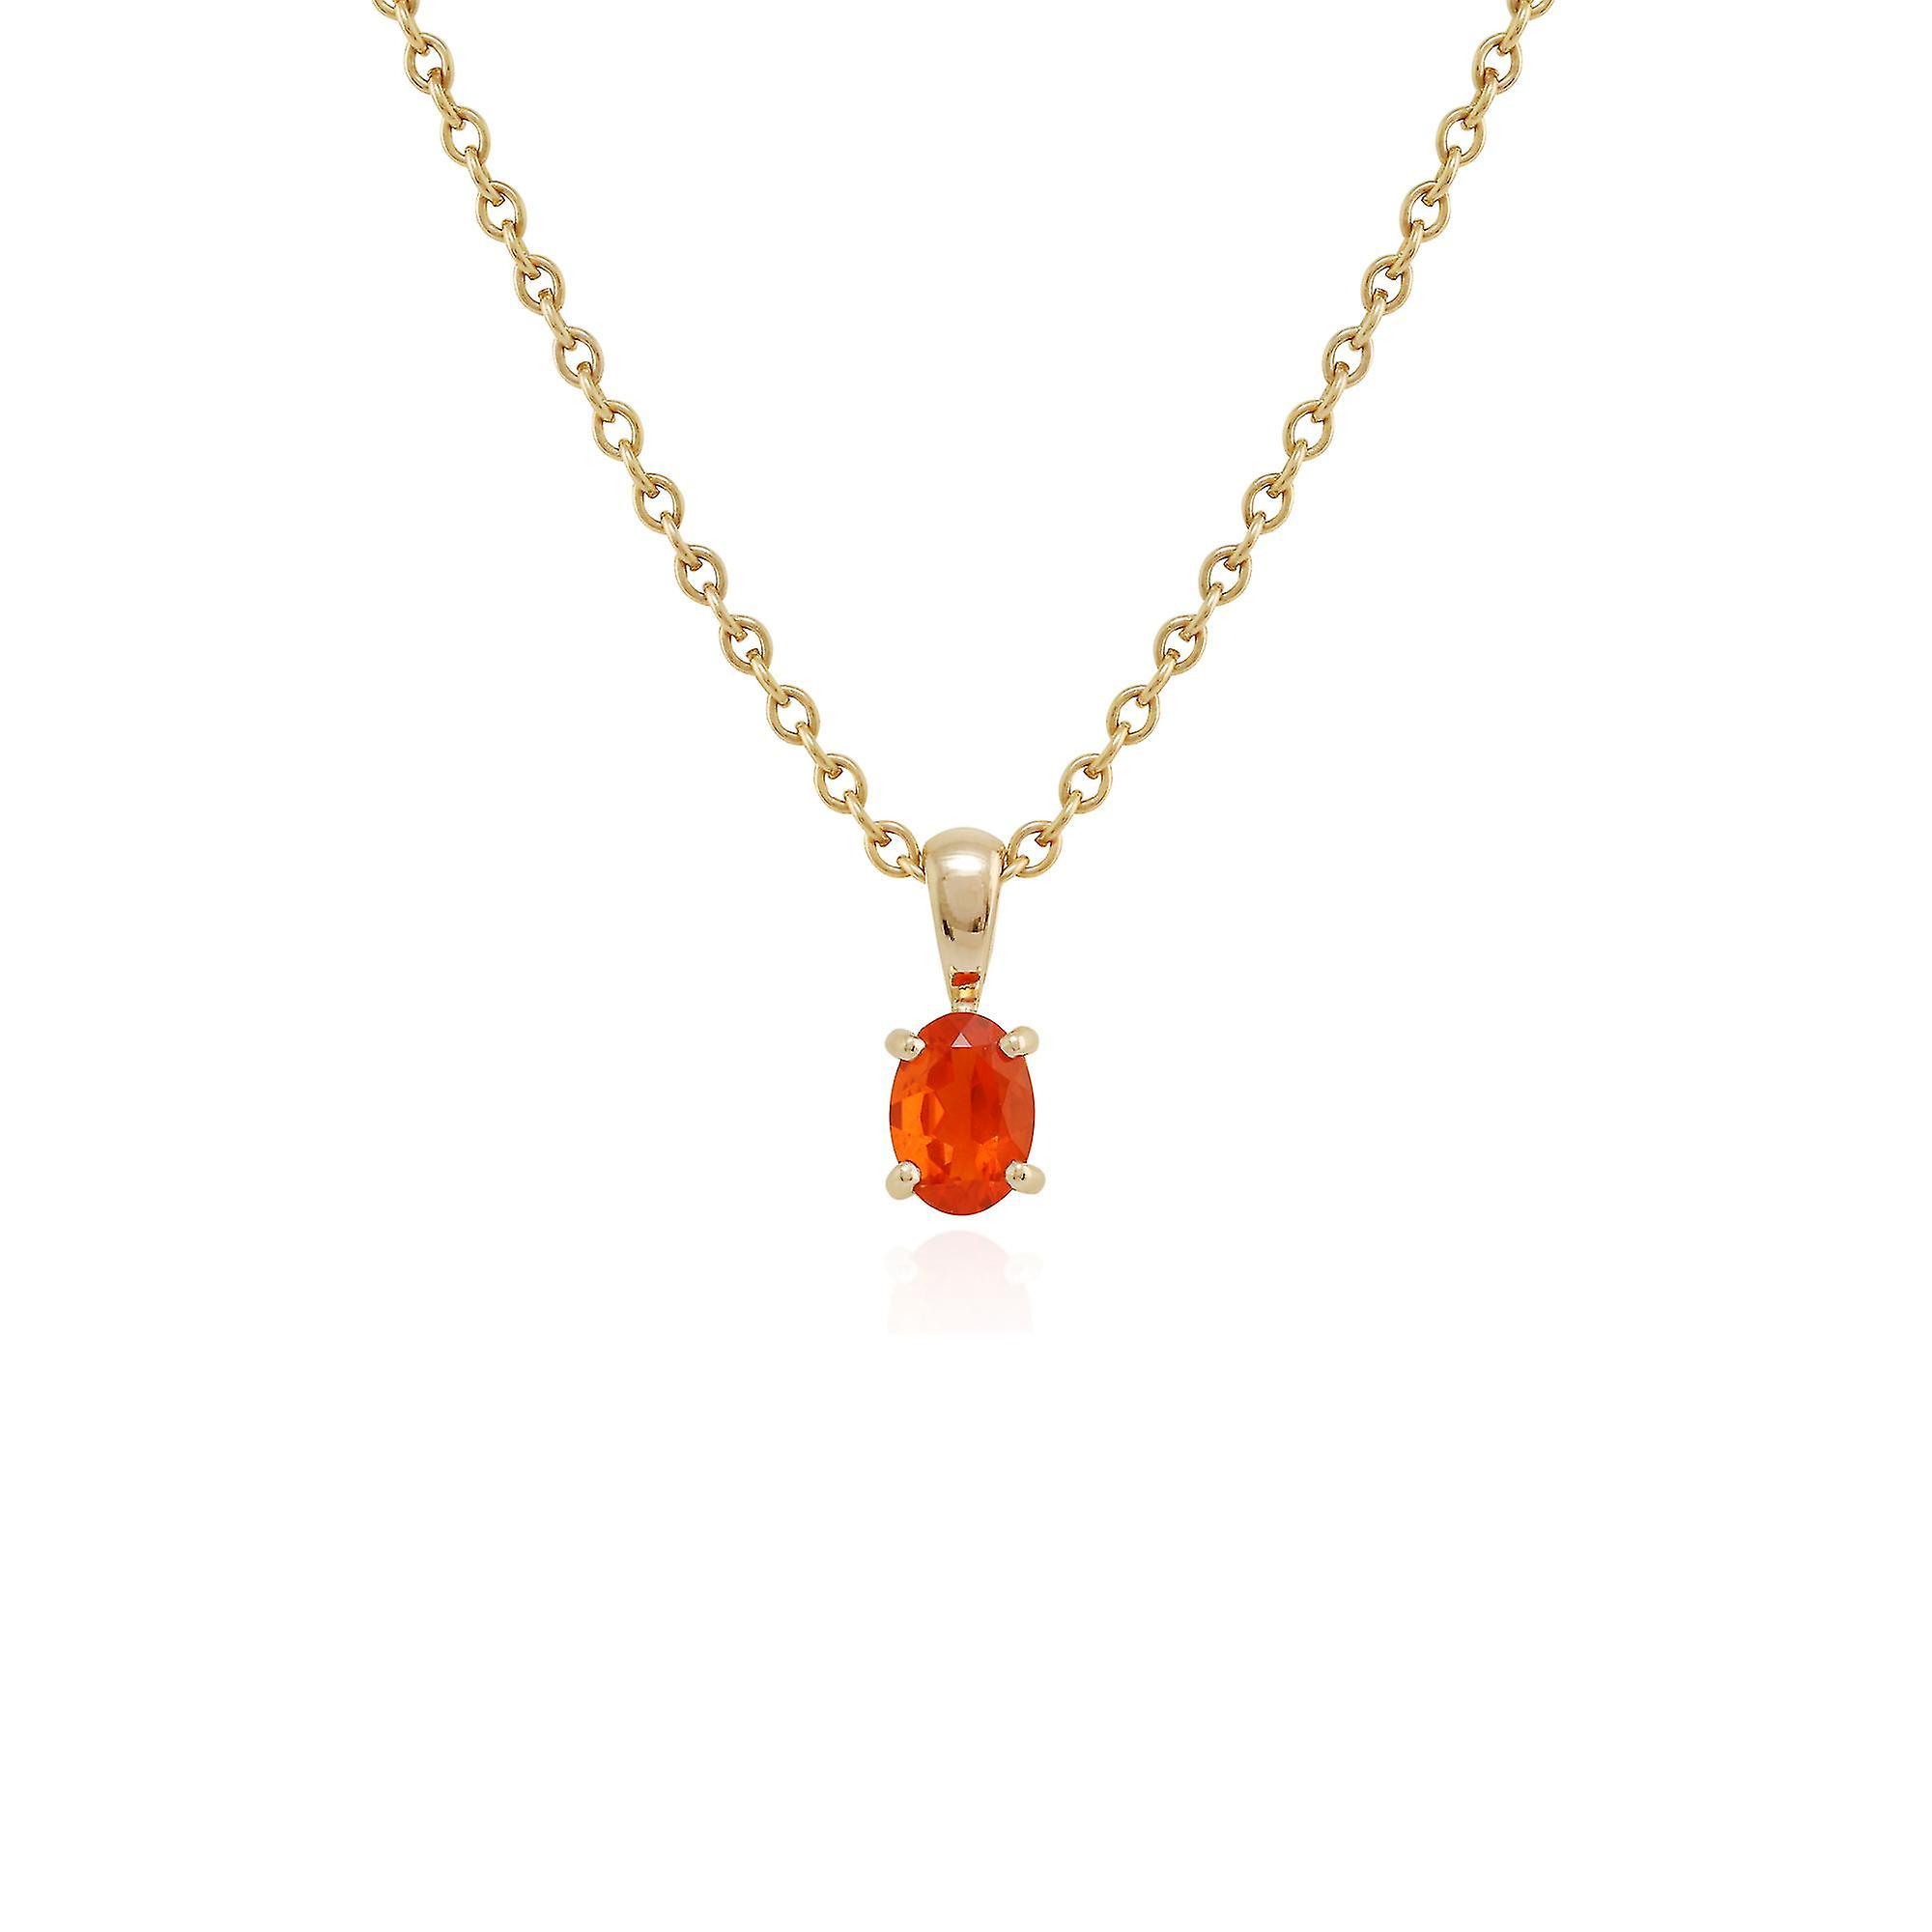 Gemondo 9ct Yellow Gold Fire Opal Single Stone 45cm Necklace